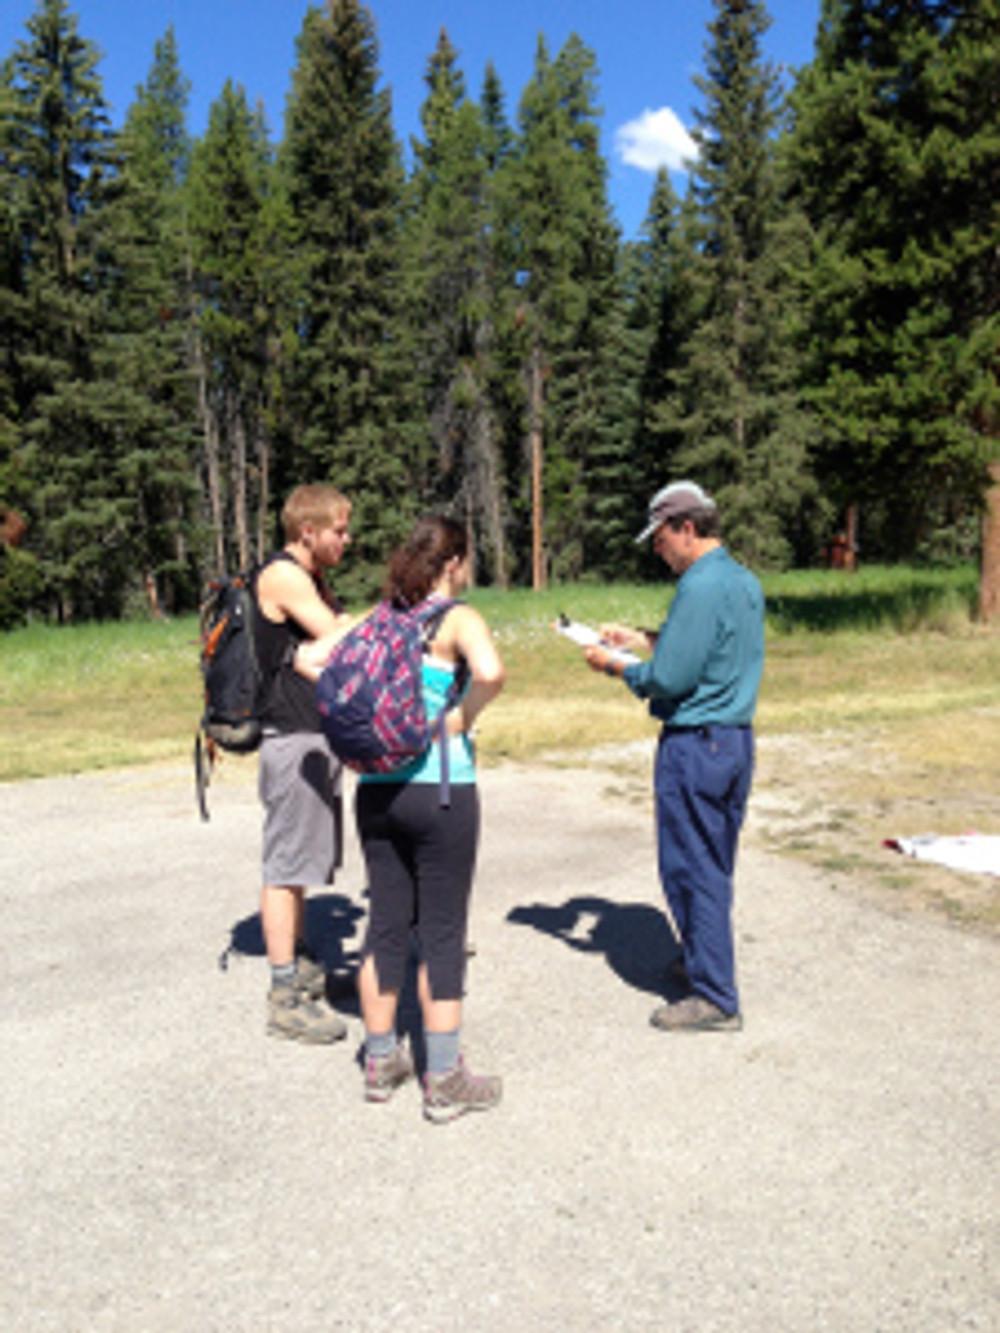 Conducting visitor surveys at the trailhead